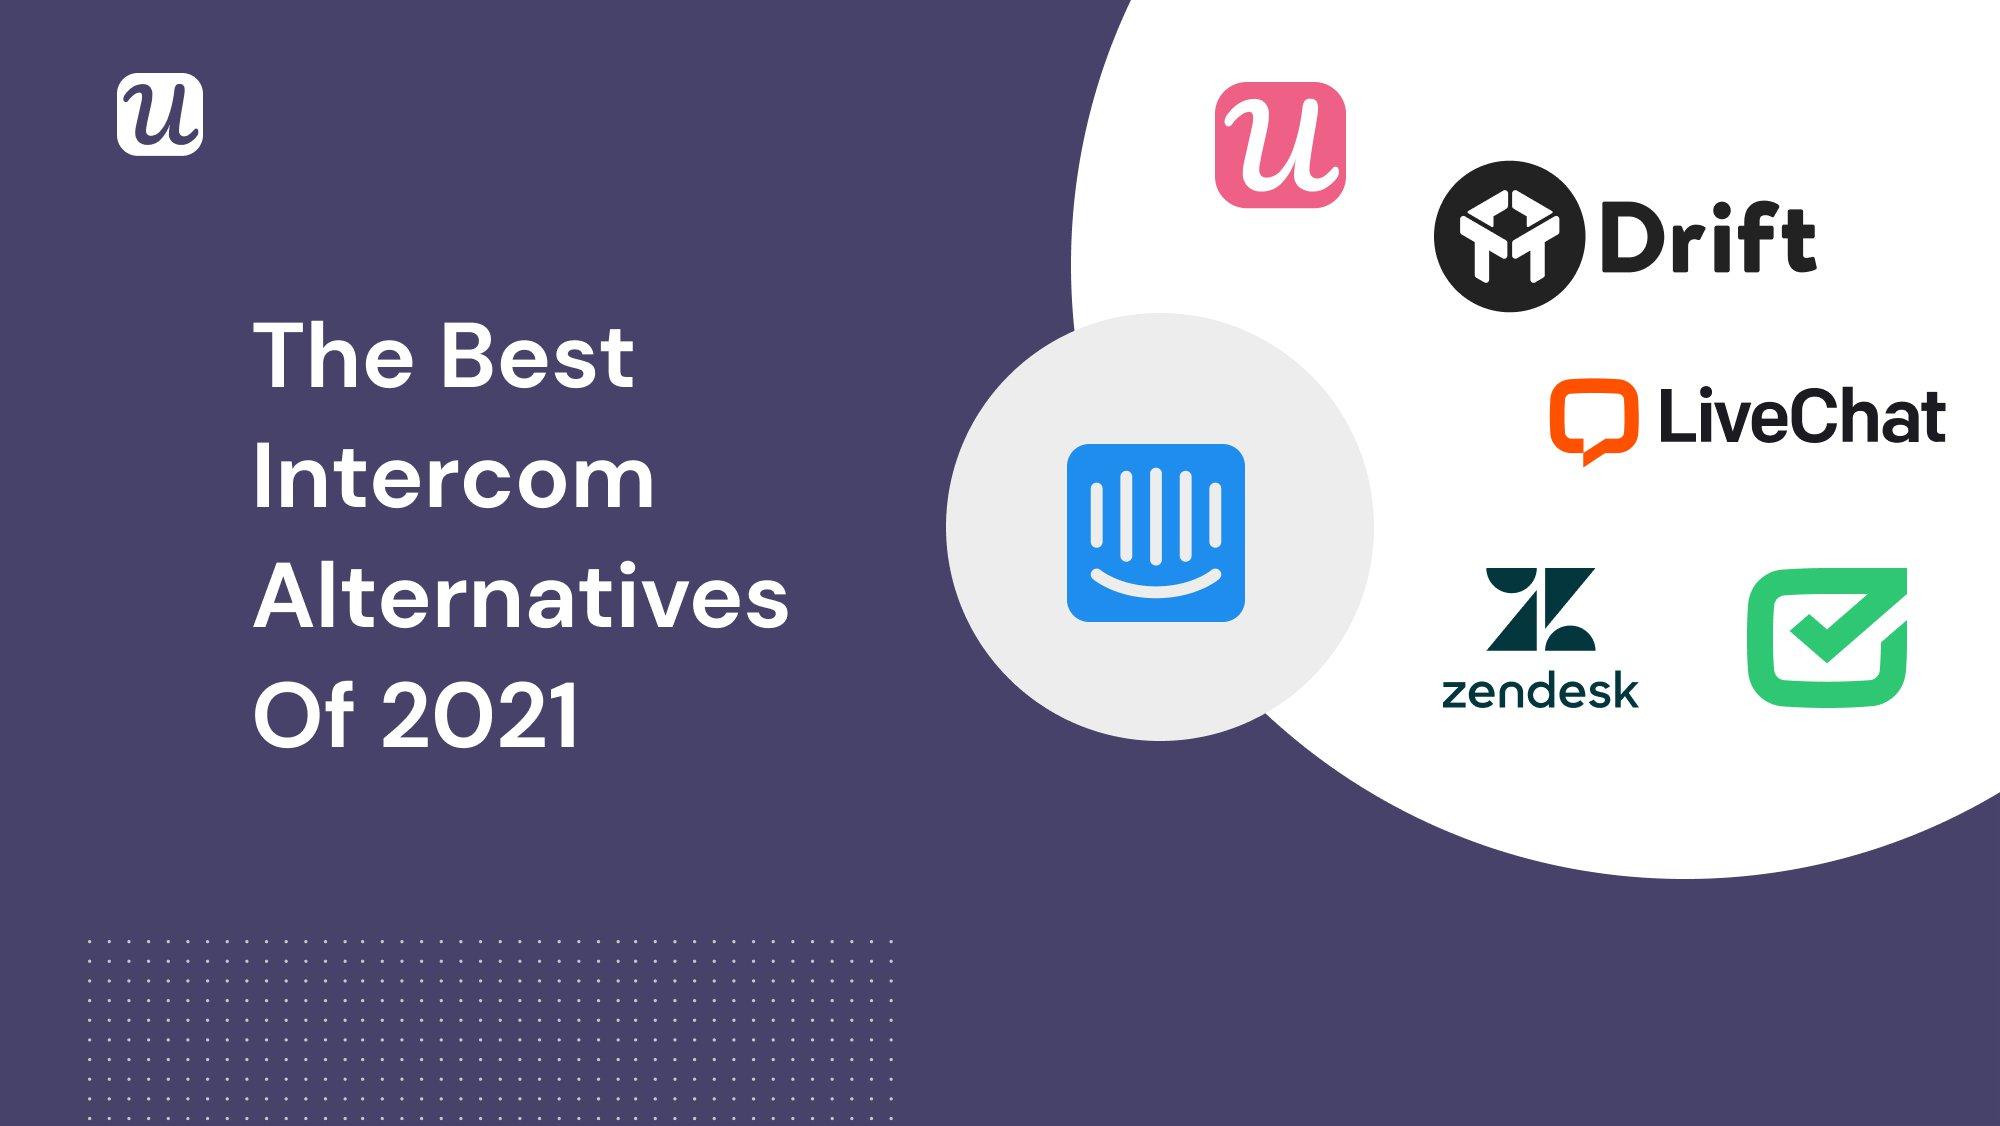 The Best Intercom Alternatives of 2021